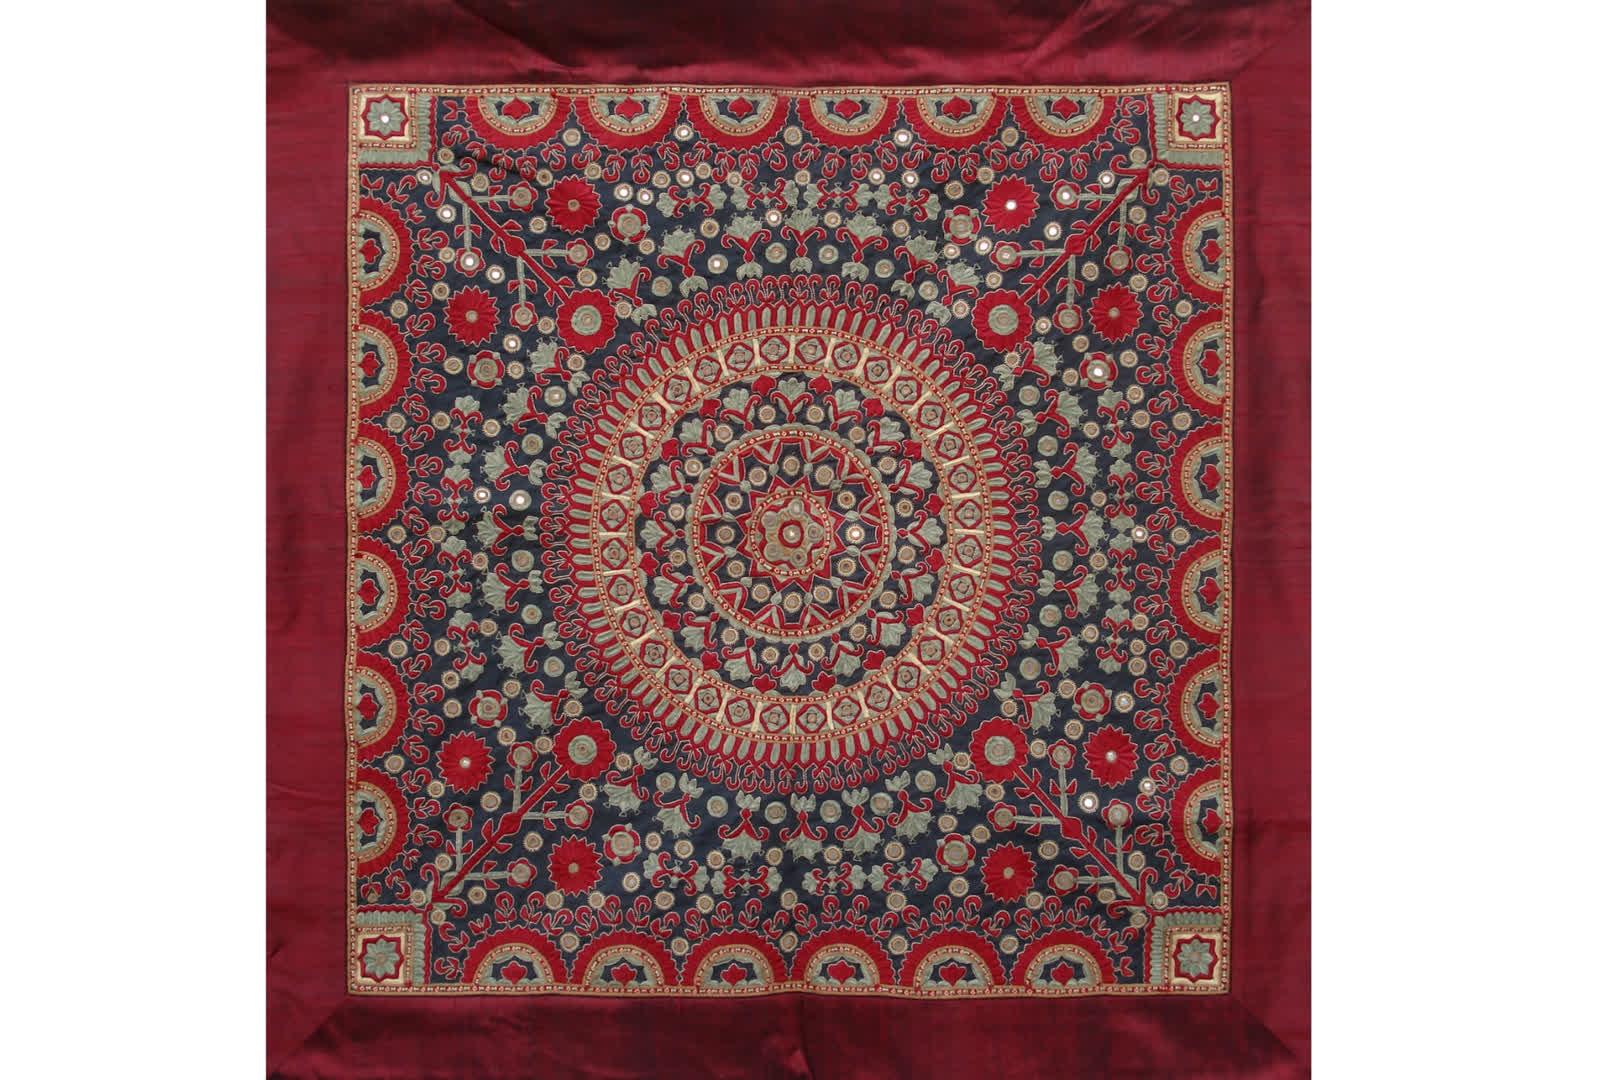 Pako embroidery work done by the women of Meghwar Community   Qasab Kutch Crafts